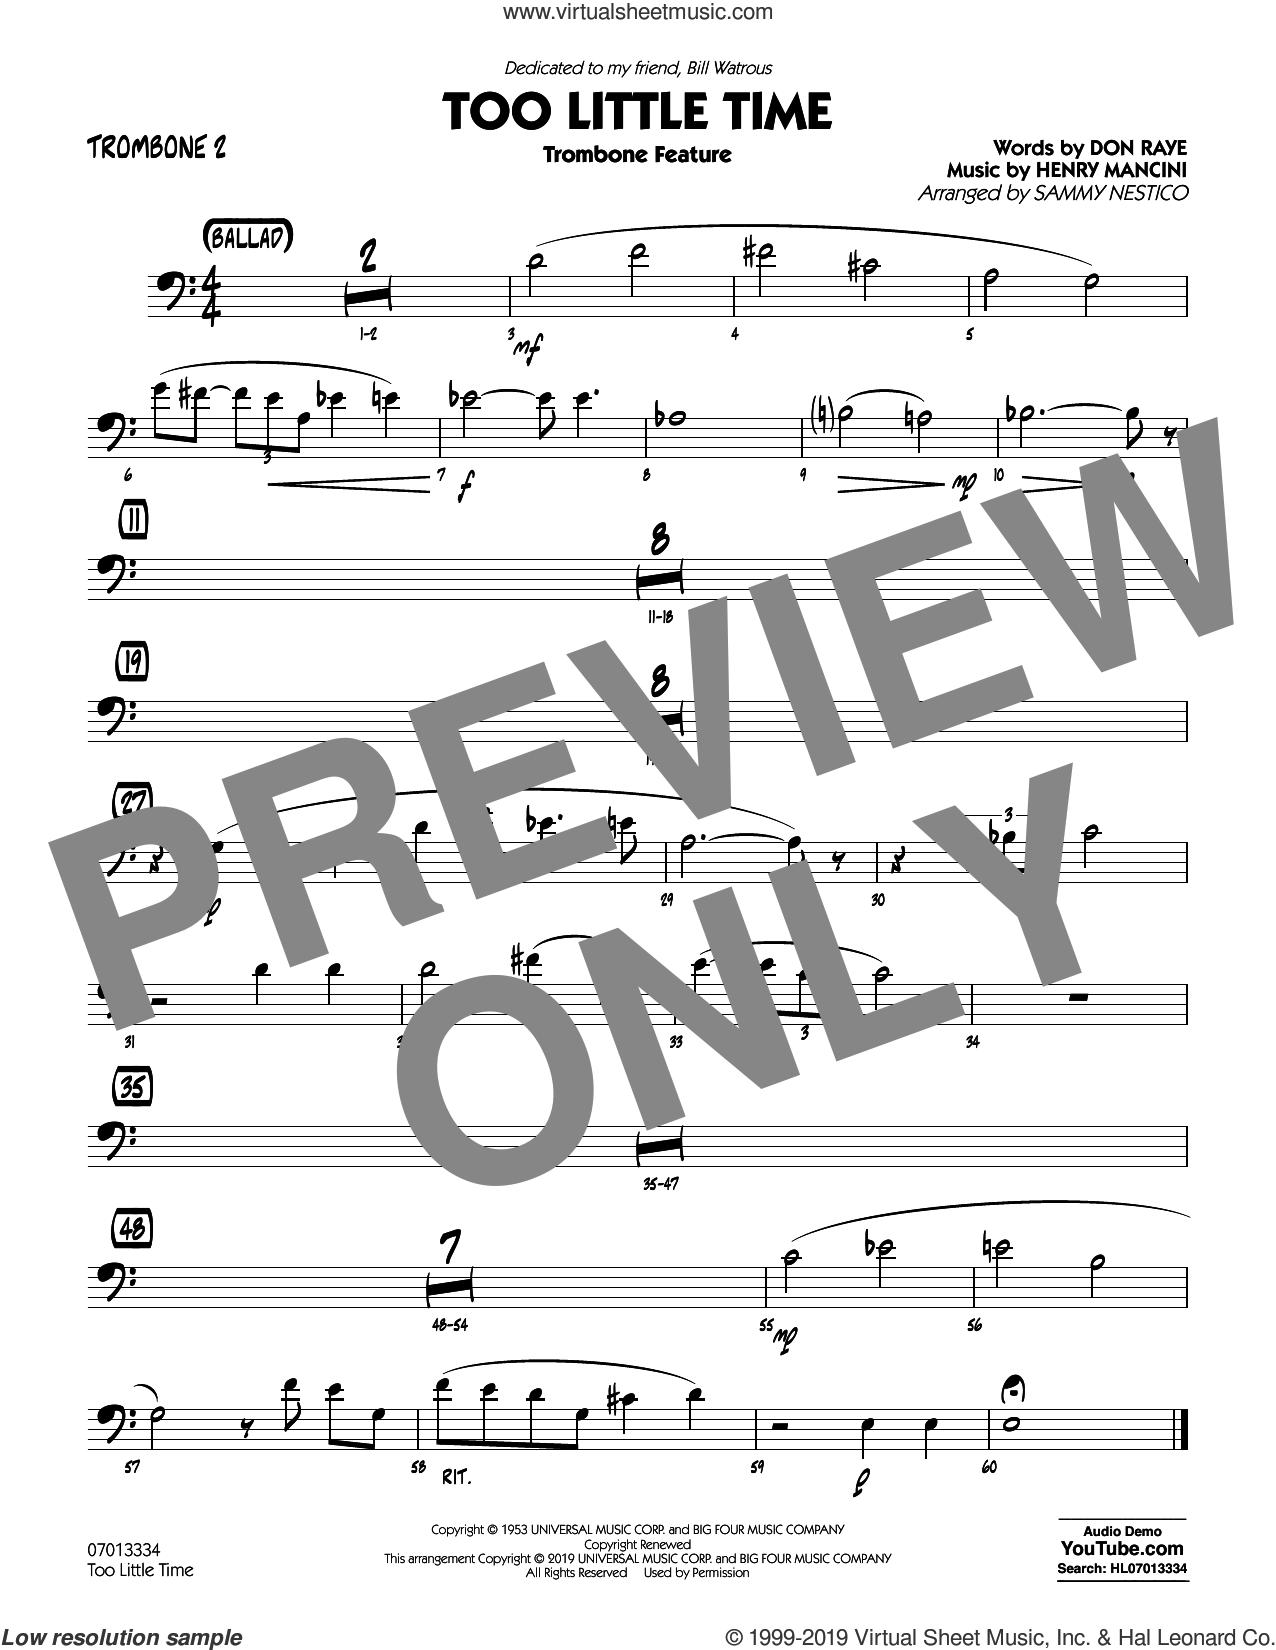 Too Little Time (arr. Sammy Nestico), conductor score (full score) sheet music for jazz band (trombone 2) by Henry Mancini, Sammy Nestico, Bill Watrous and Don Raye, intermediate skill level